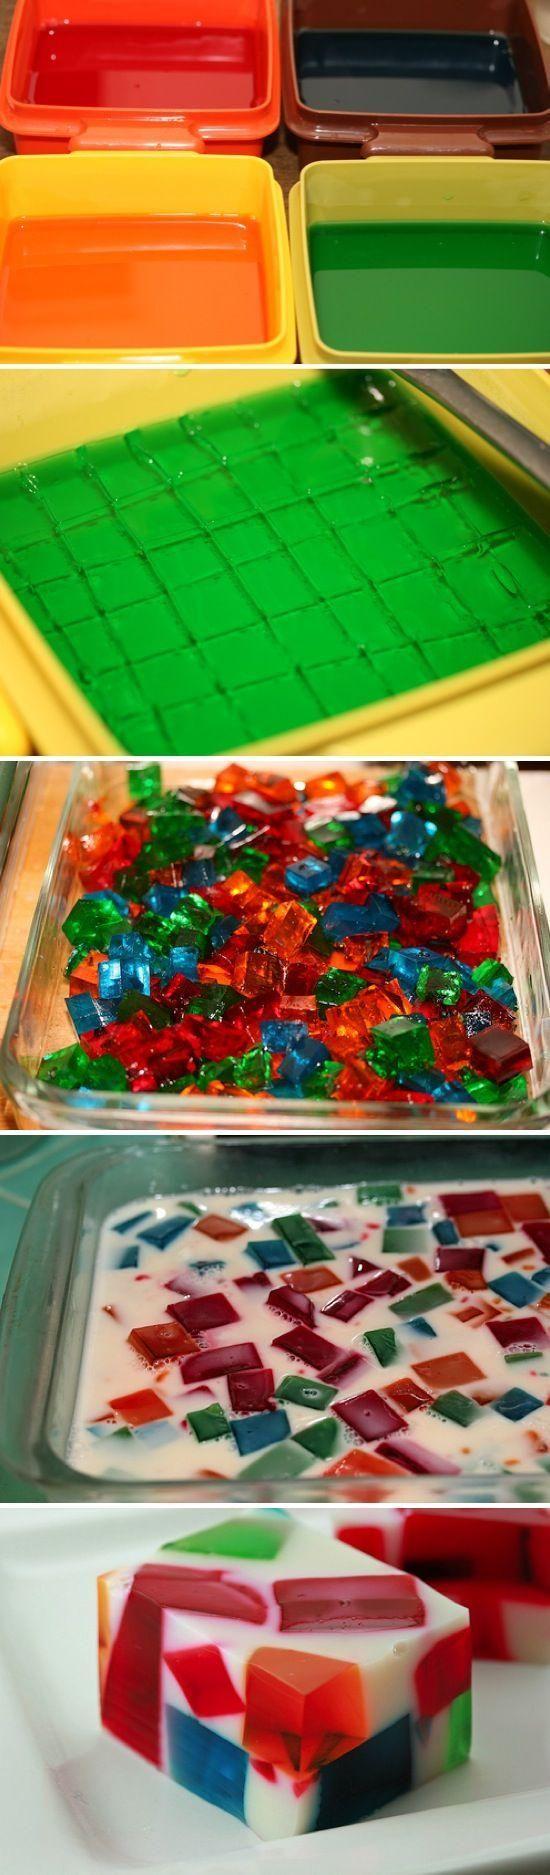 *Broken Glass Jello Yammy recipes, have you tried? - http://chocolateaddiction.info/broken-glass-jello/  #chocolate #dessert #recipes